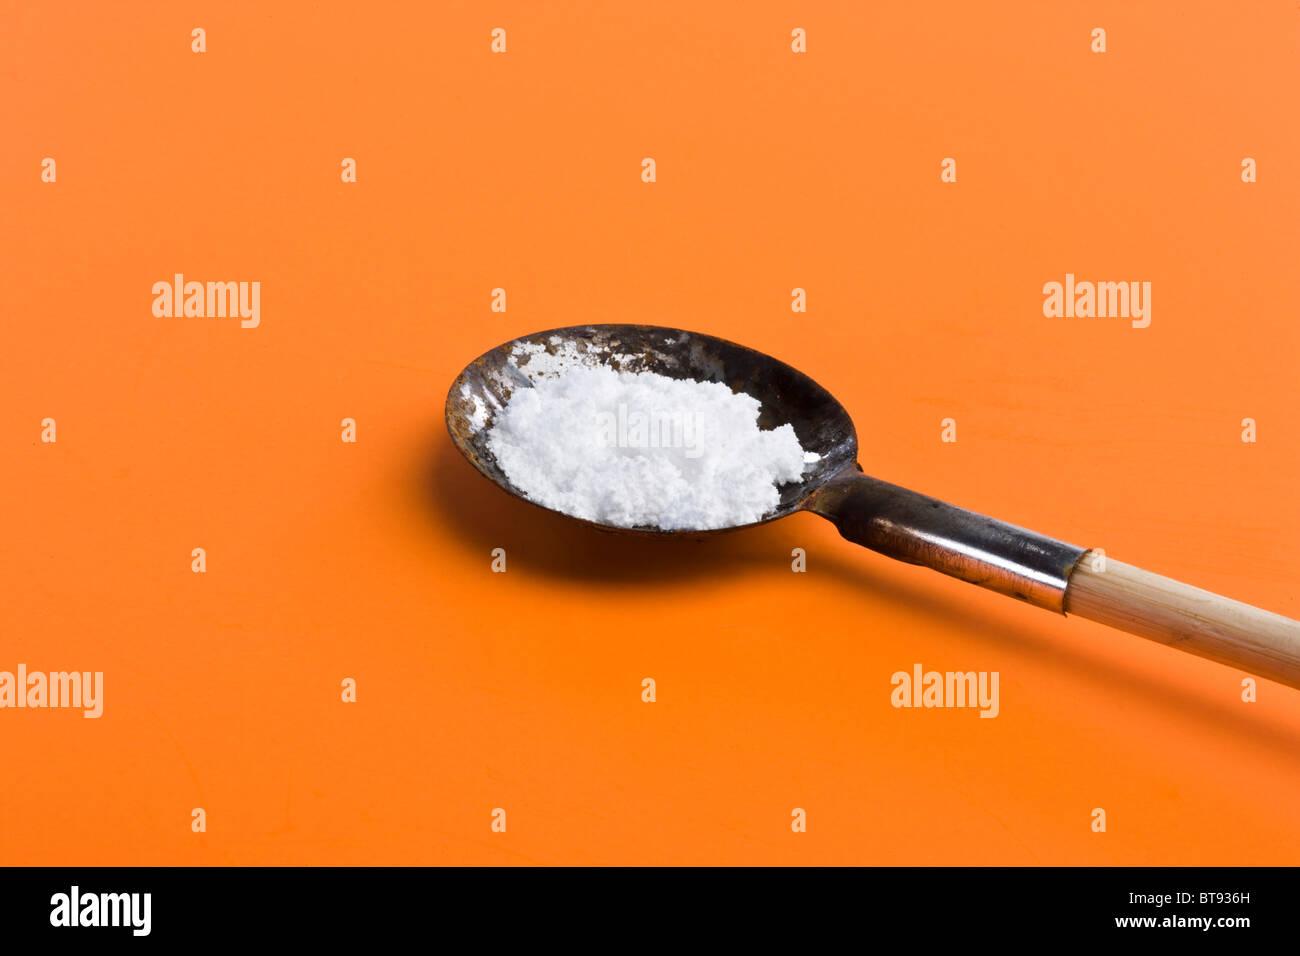 Heroin - Stock Image